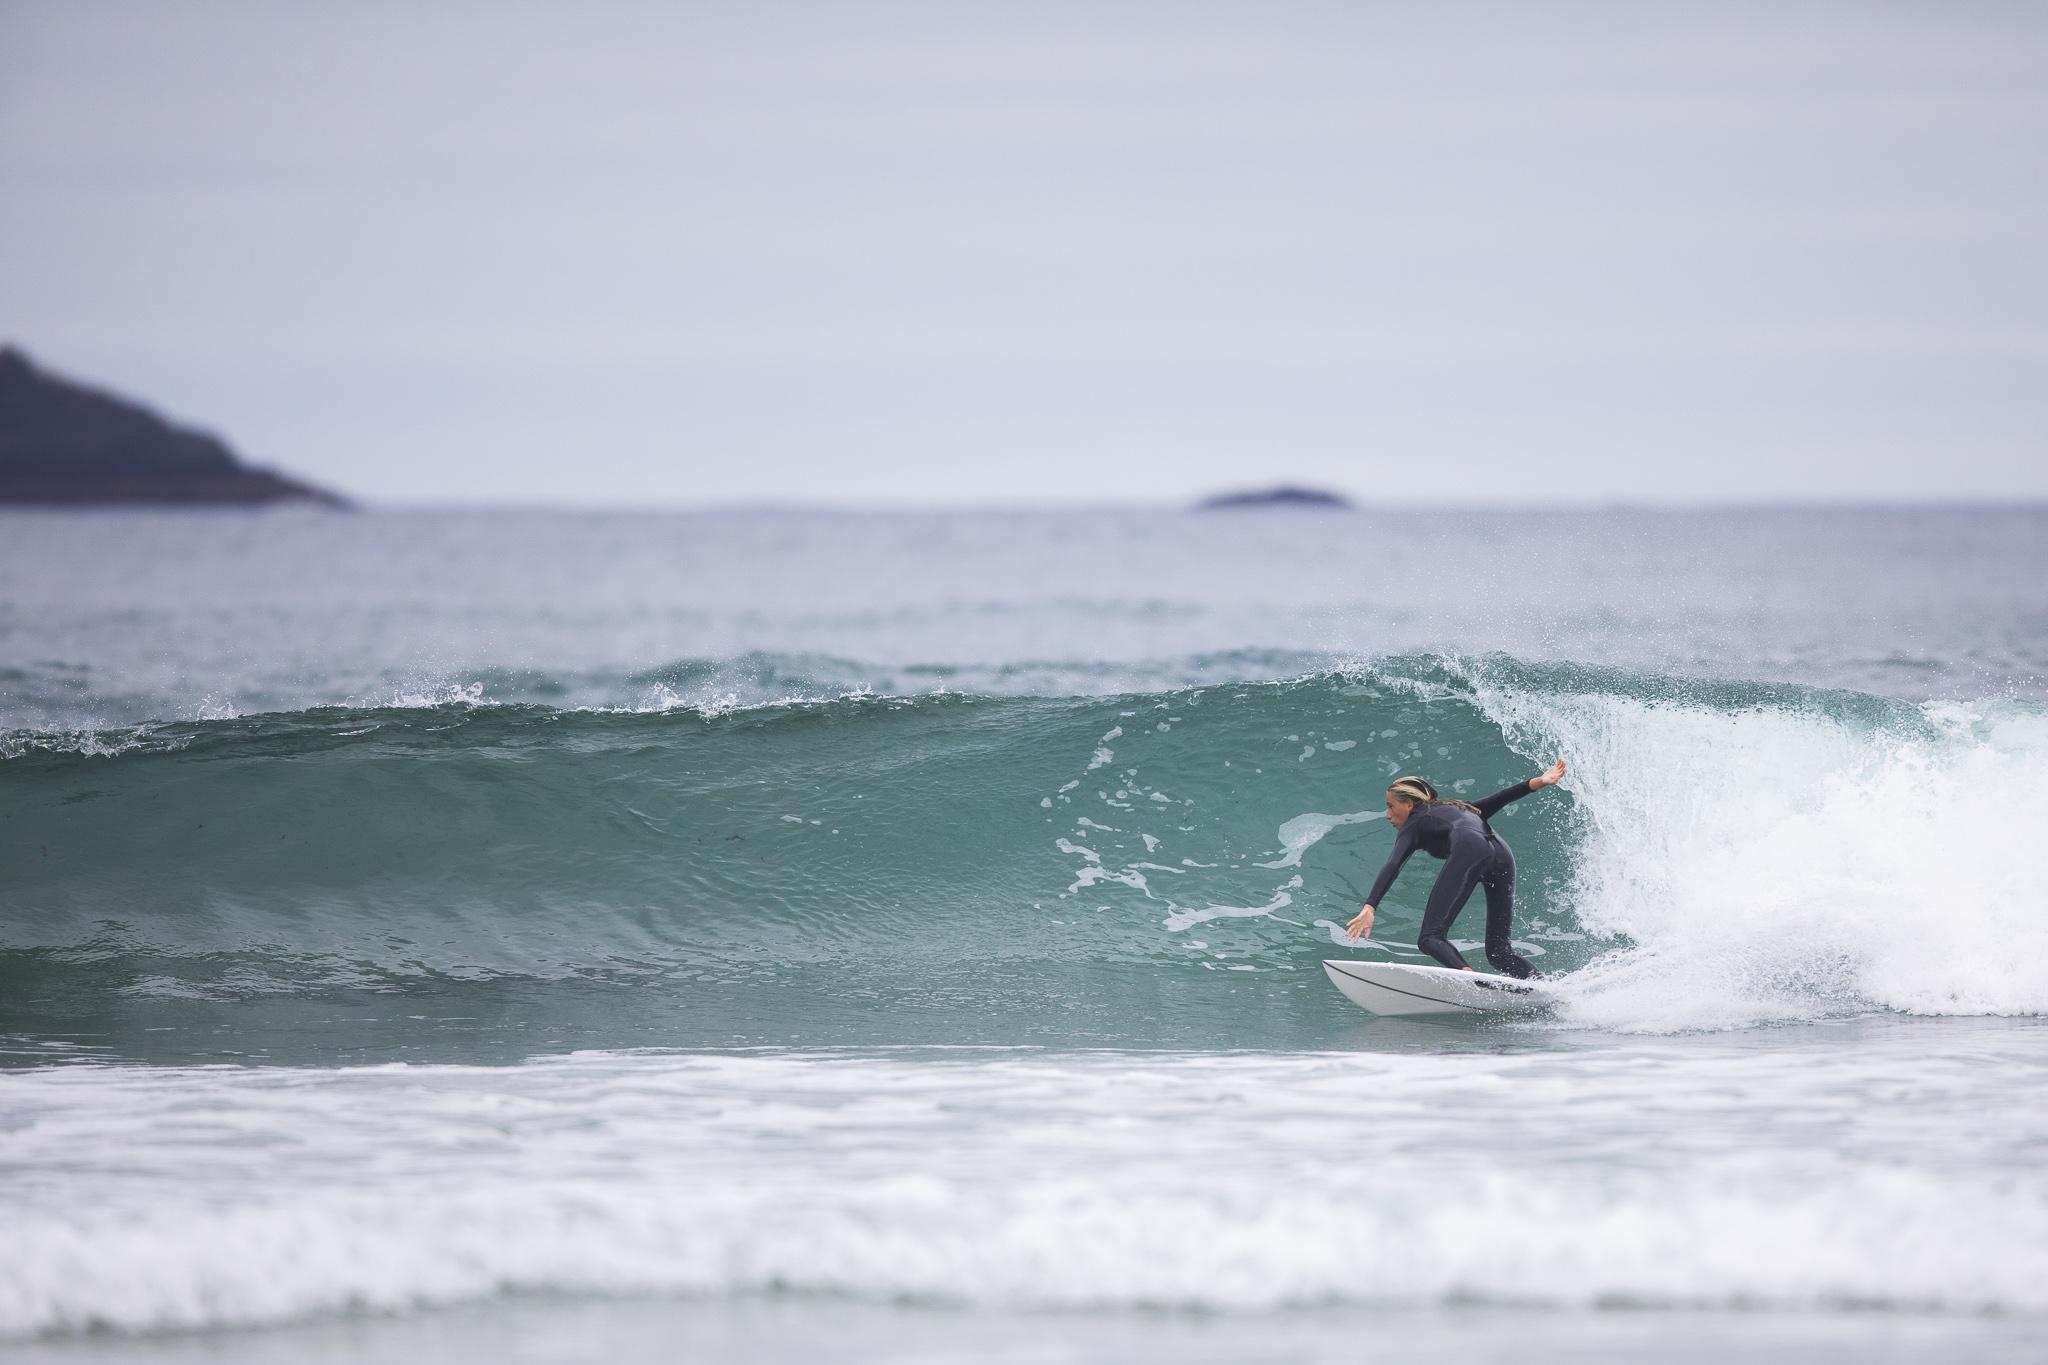 d5abb3ec0362 Ava Henderson, 13, isn't in a hurry to compete in Australia just yet.  Photo: Derek Morrison